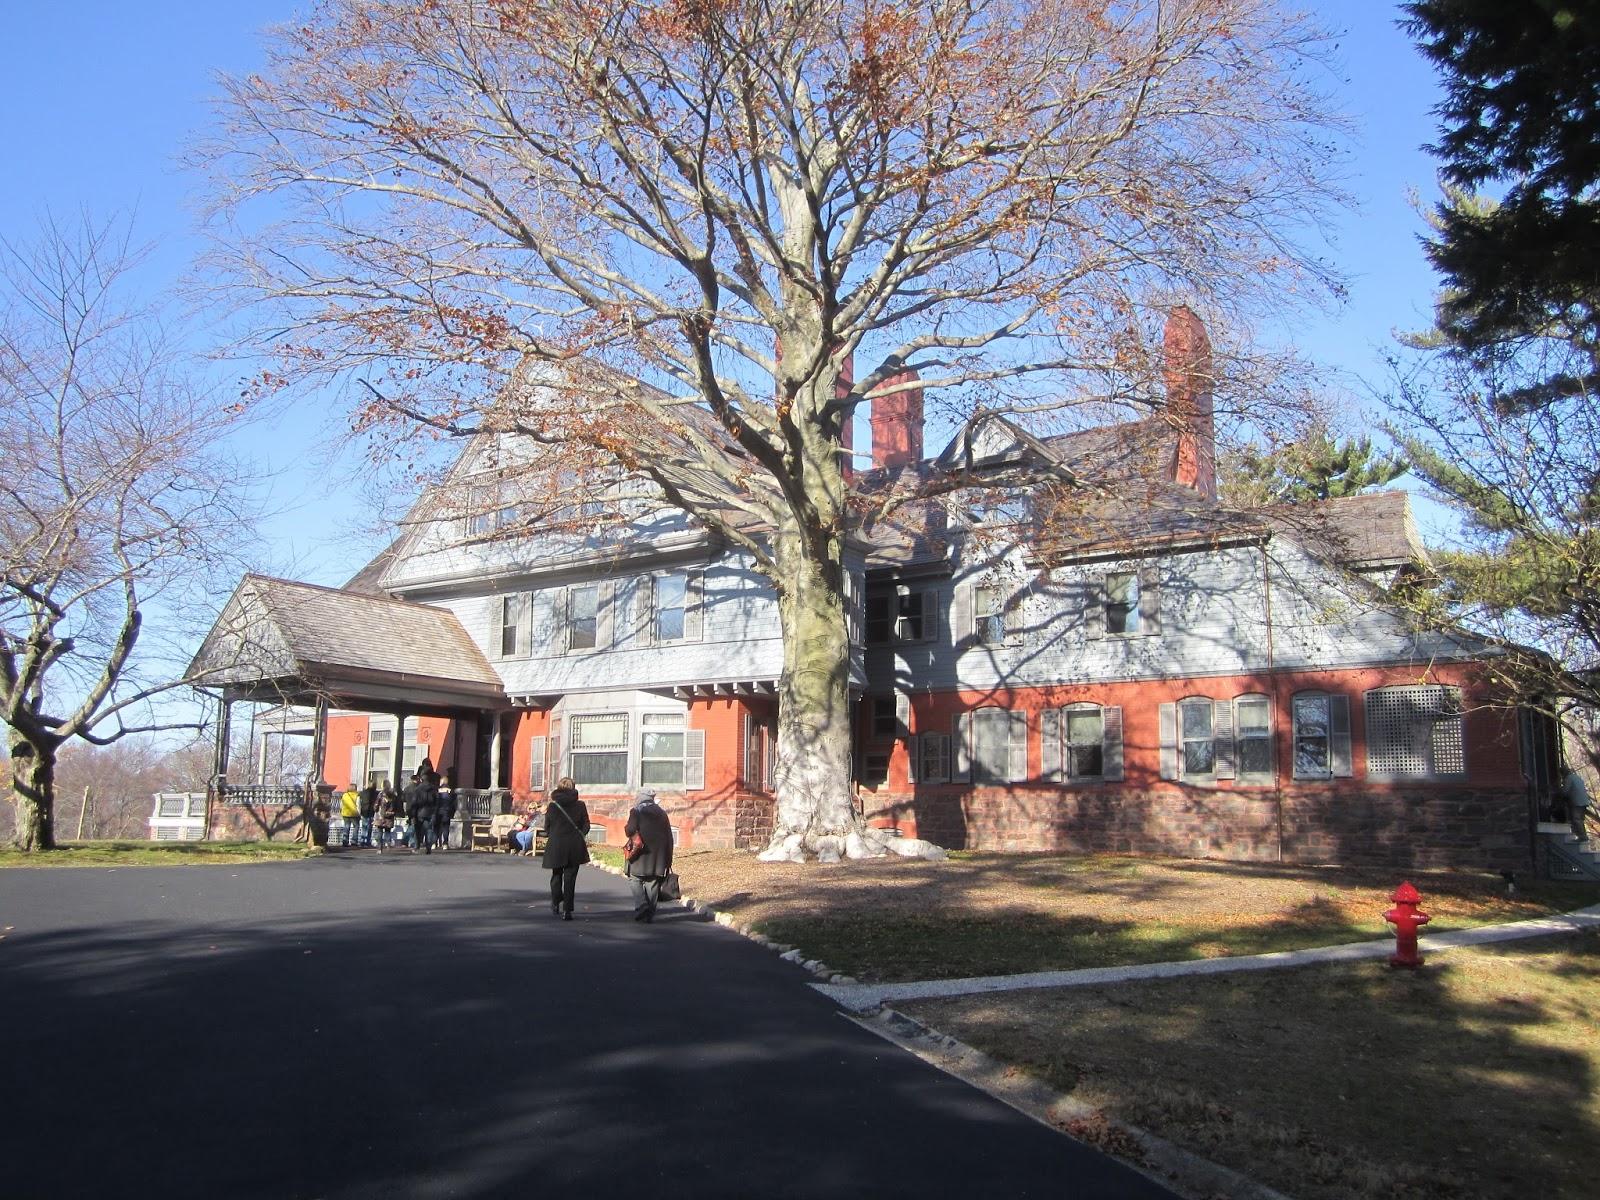 roosevelt extensive region home